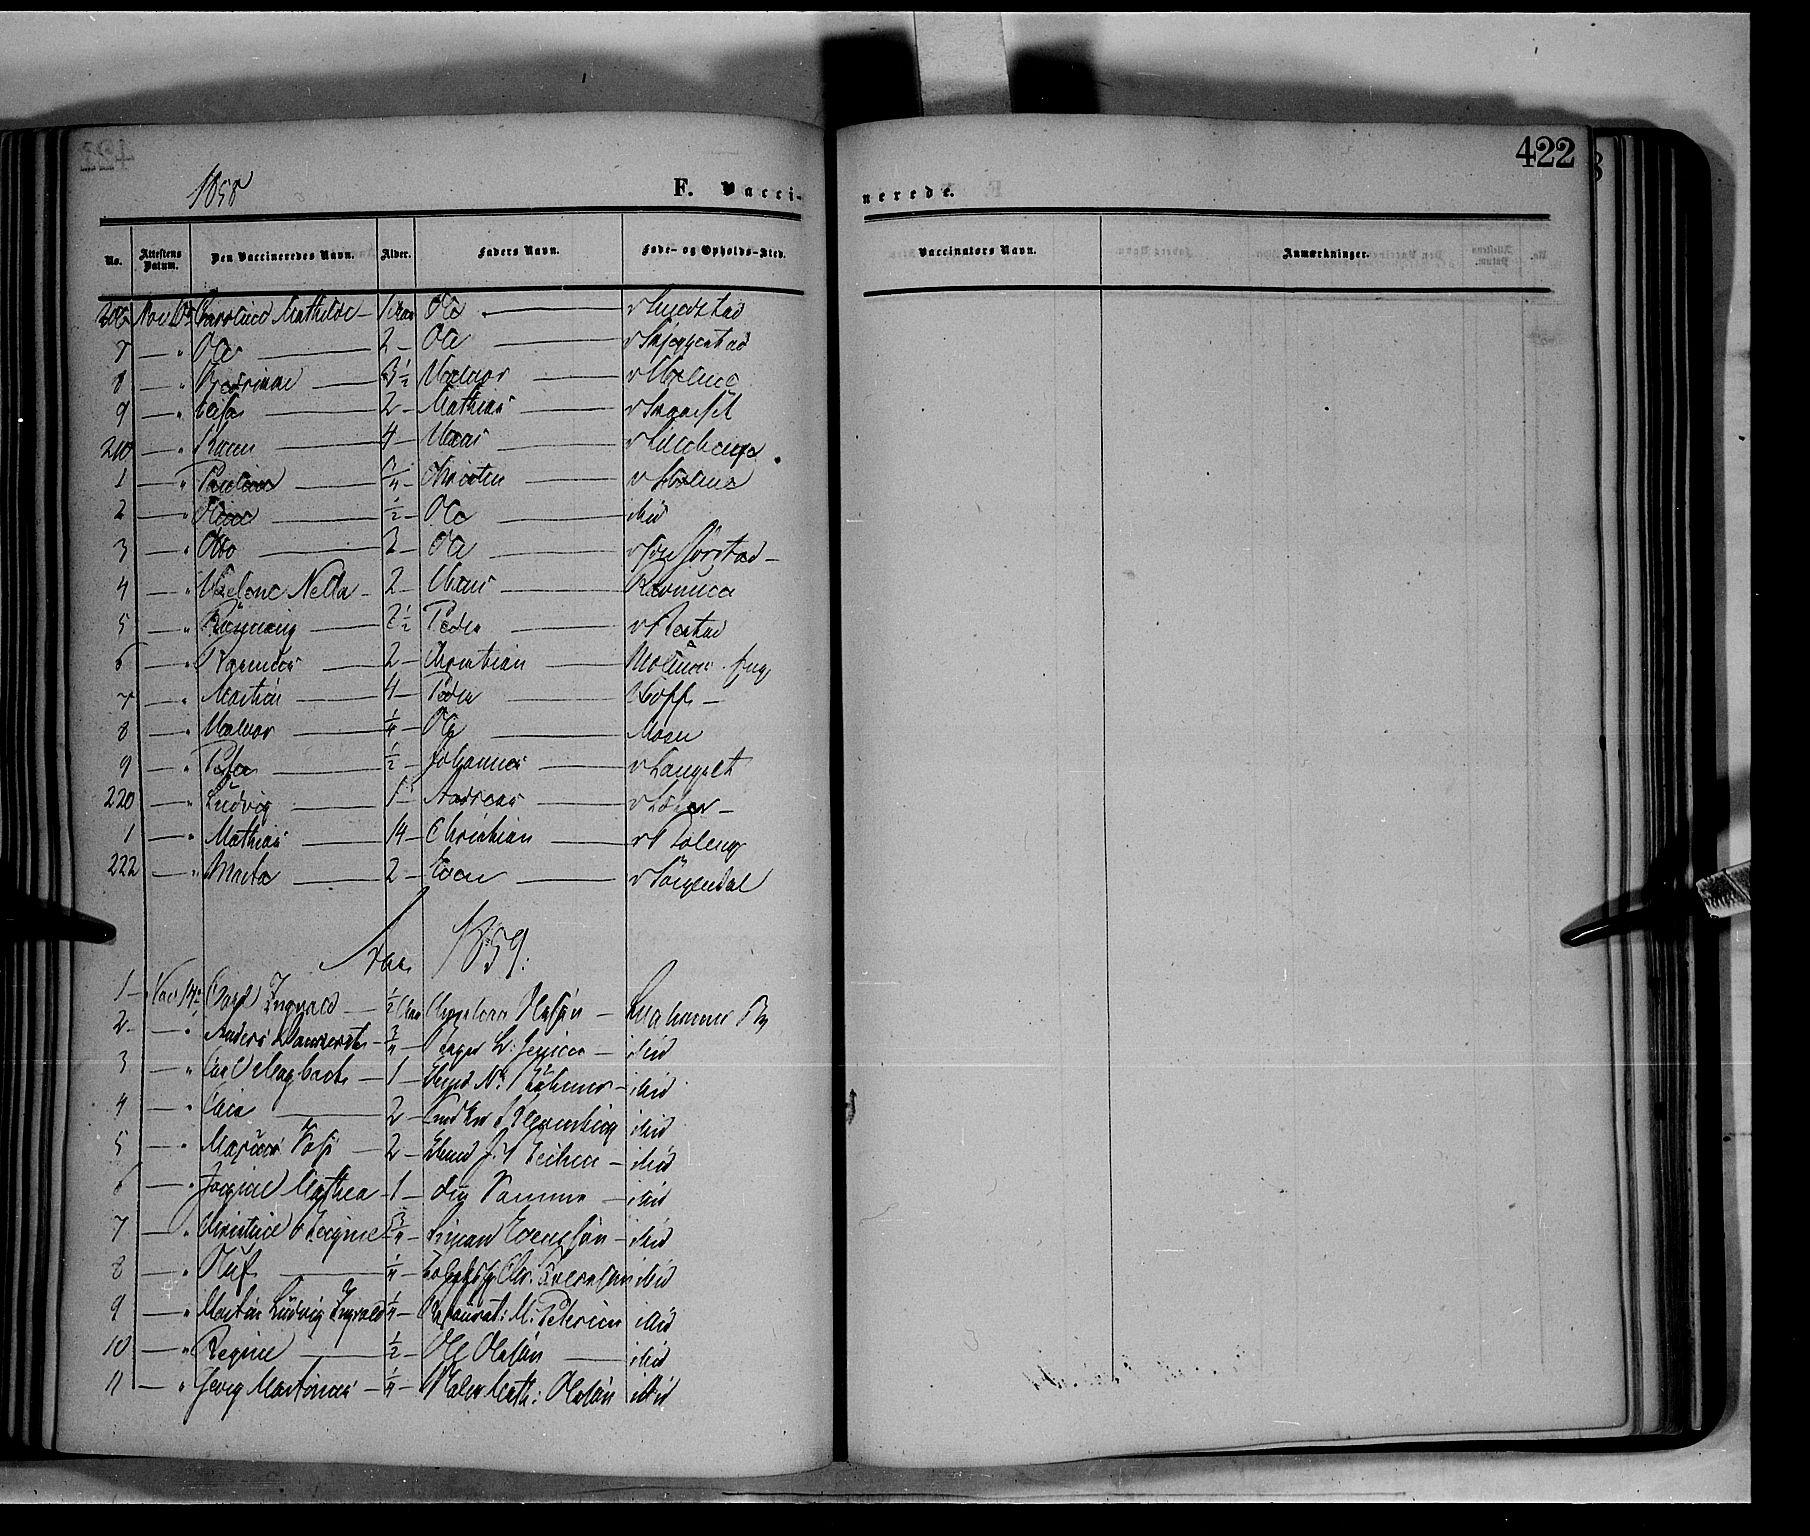 SAH, Fåberg prestekontor, Ministerialbok nr. 6B, 1855-1867, s. 422